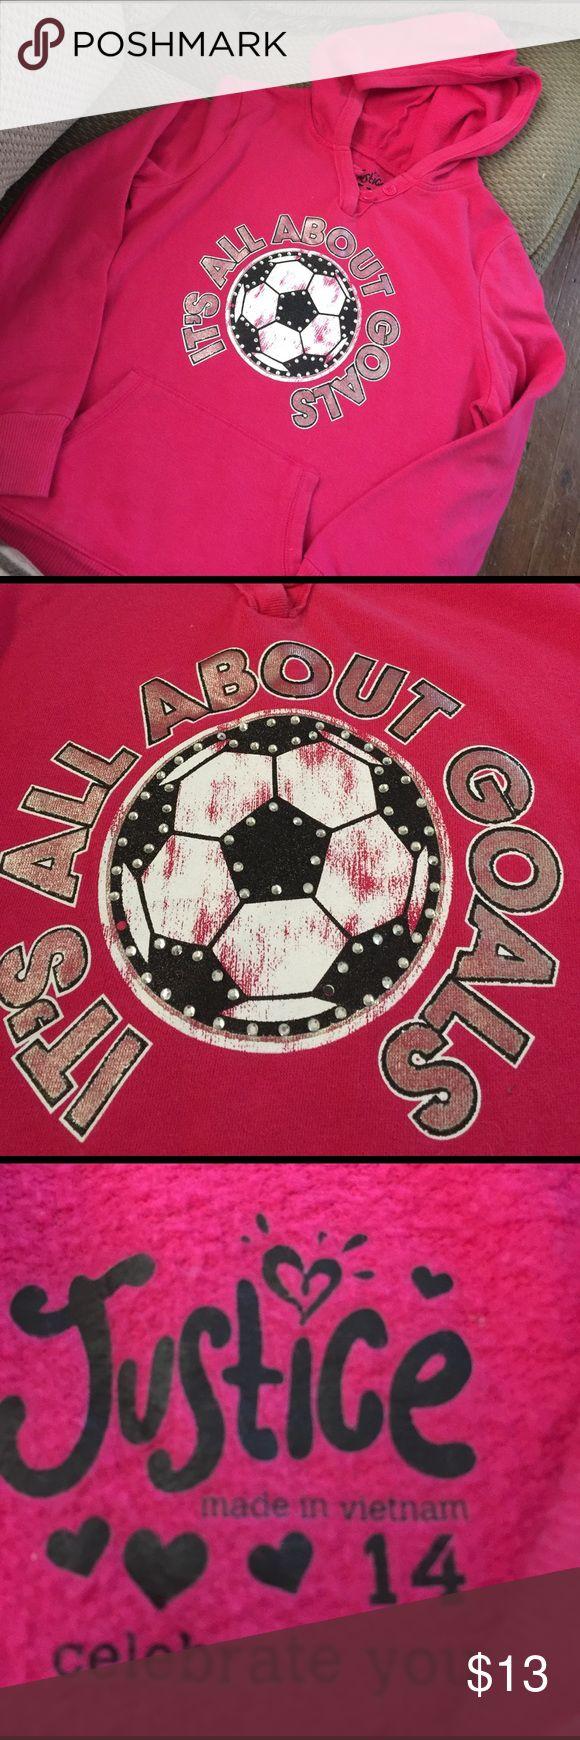 Girls Justice soccer hoodie Girls Justice soccer hoodie Justice Shirts & Tops Sweatshirts & Hoodies